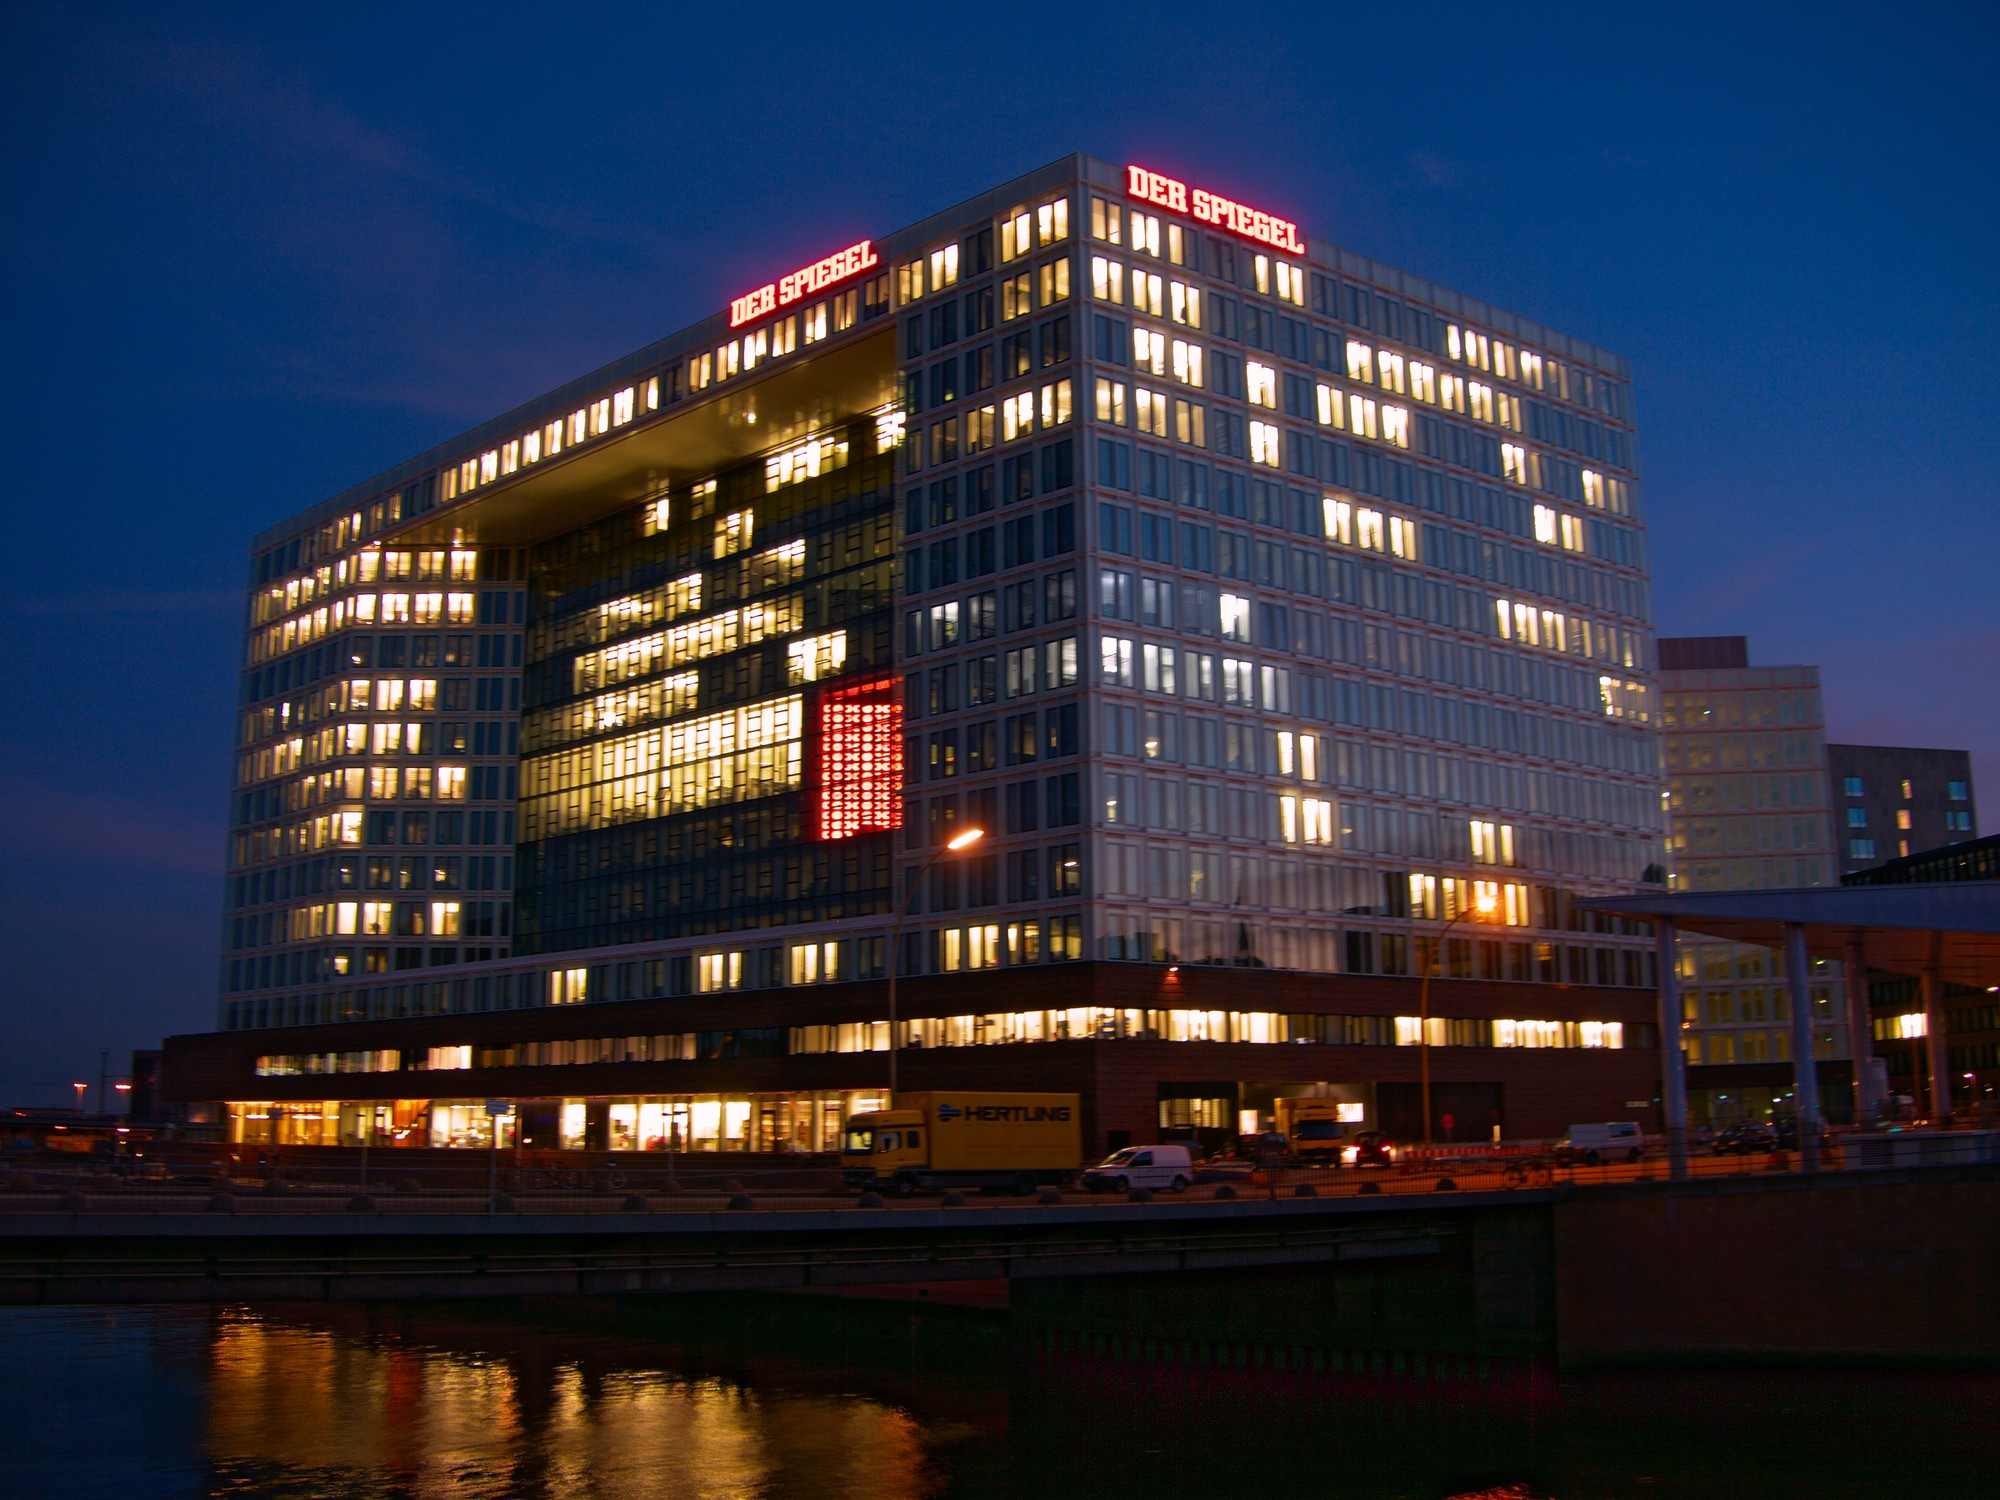 Wiki der spiegel upcscavenger for Spiegel history